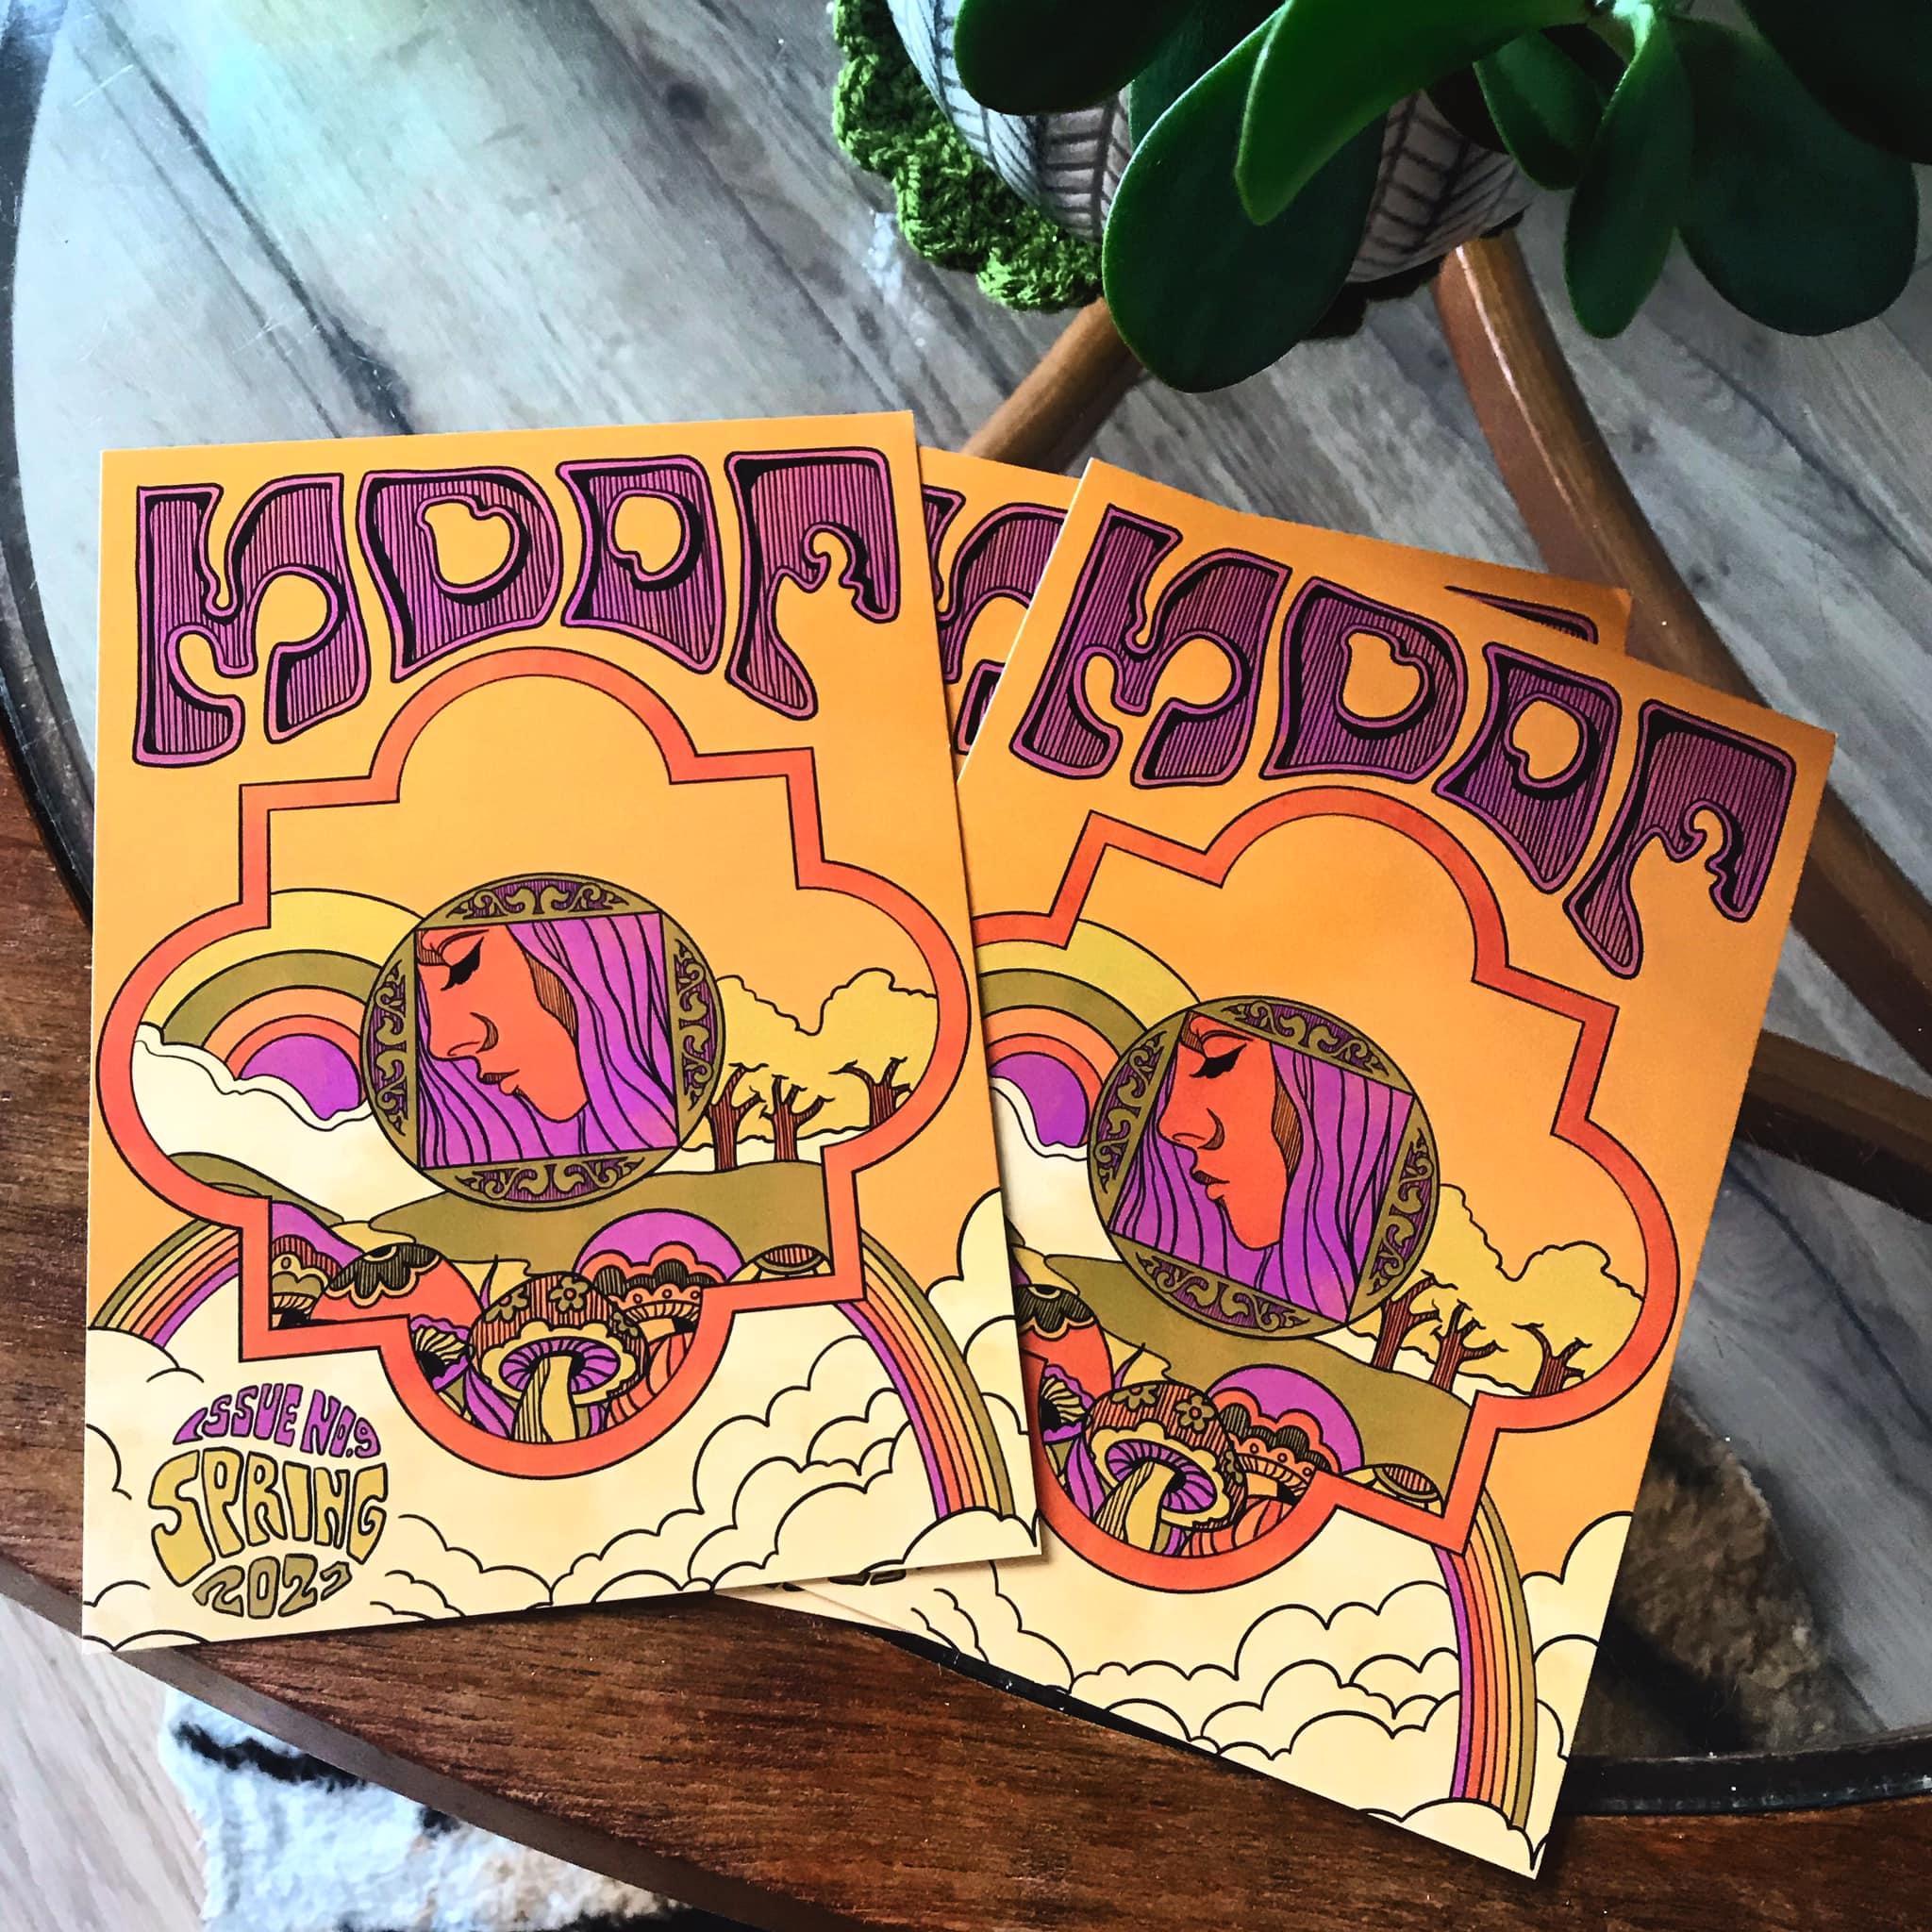 Undergound Magazine on a vintage table